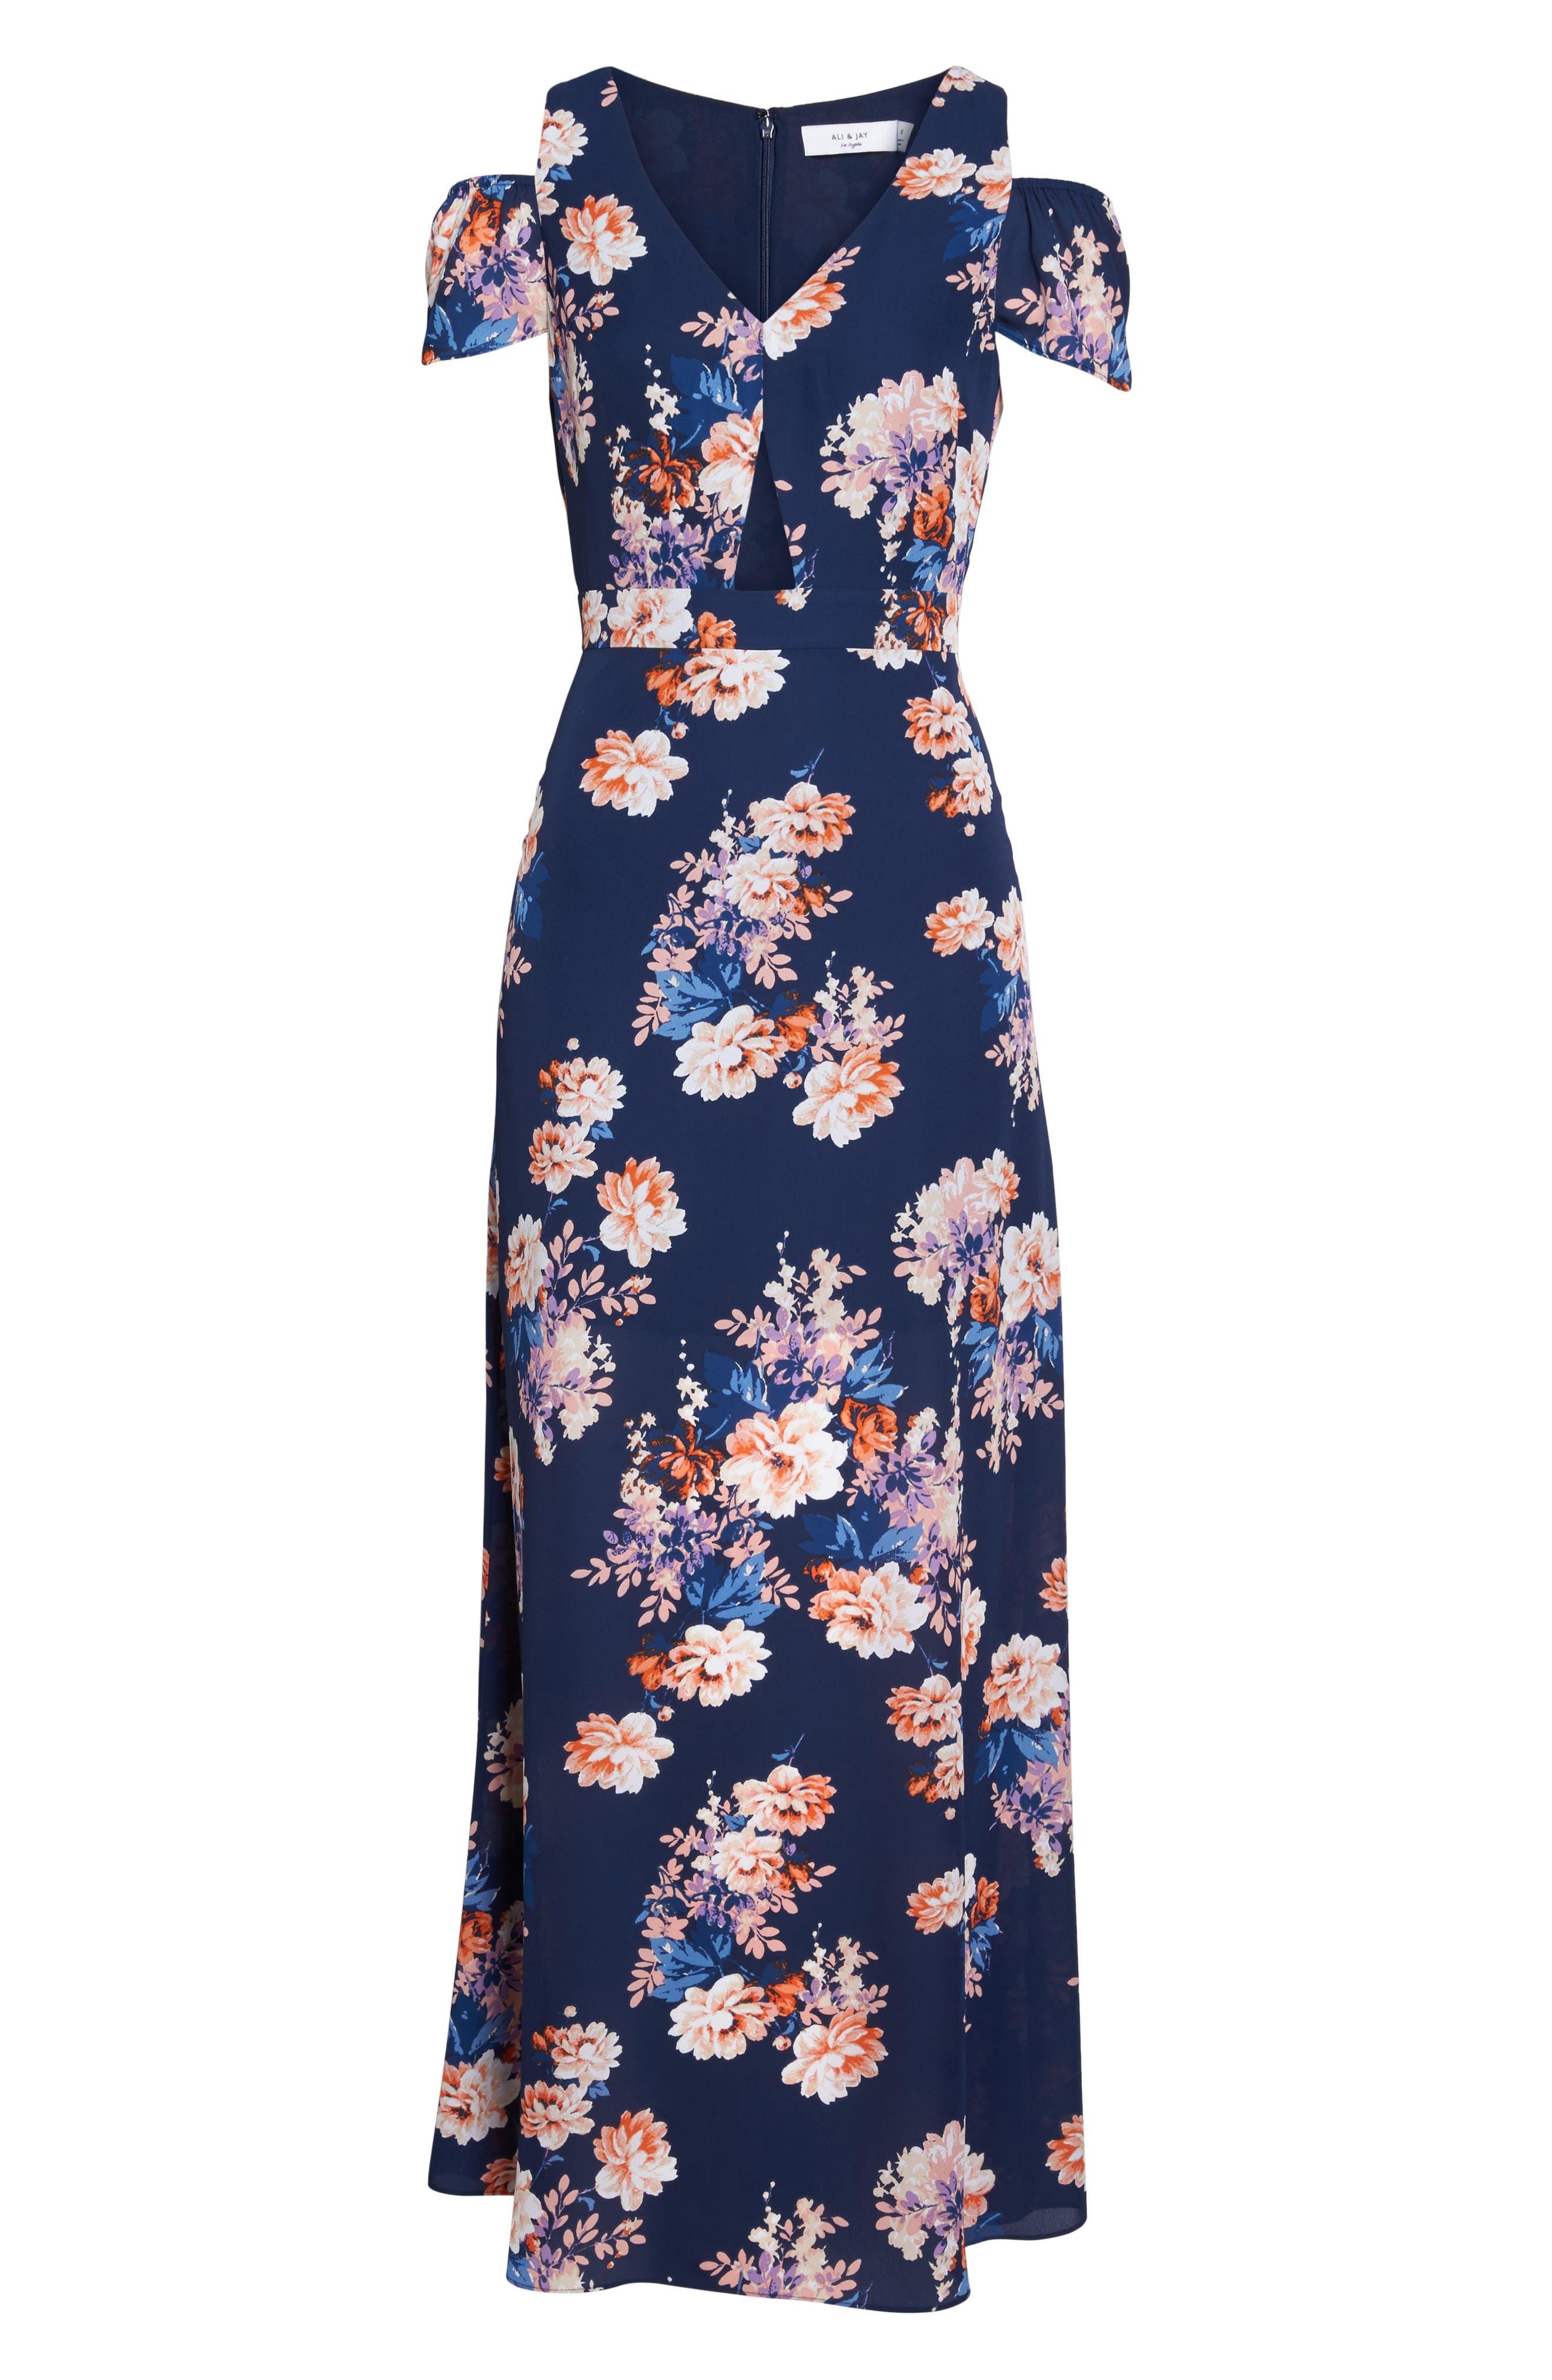 Chasing Butterflies Maxi Dress,                             Alternate thumbnail 6, color,                             400